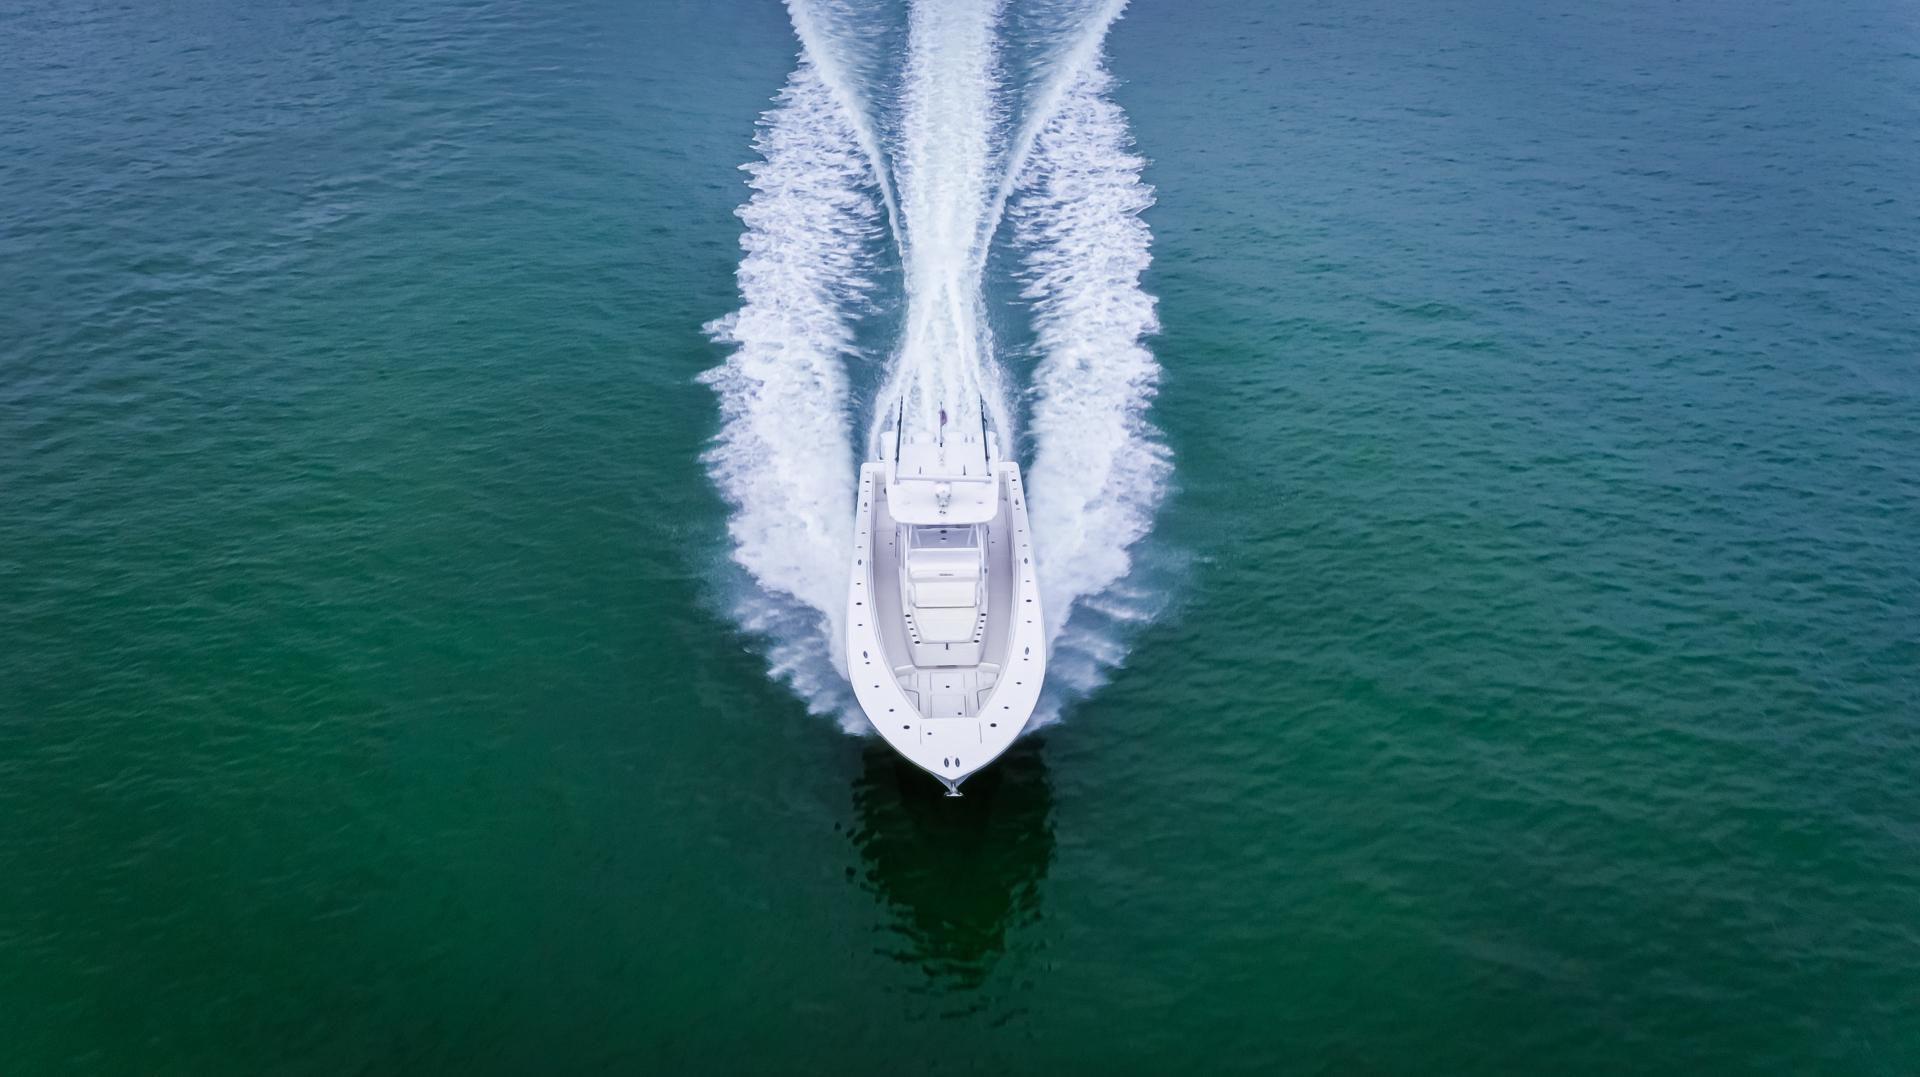 SeaHunter-45 Center Console 2016-No Name Bal Harbour-Florida-United States-2016 Sea Hunter 45 Center Console  Profile-1574267   Thumbnail